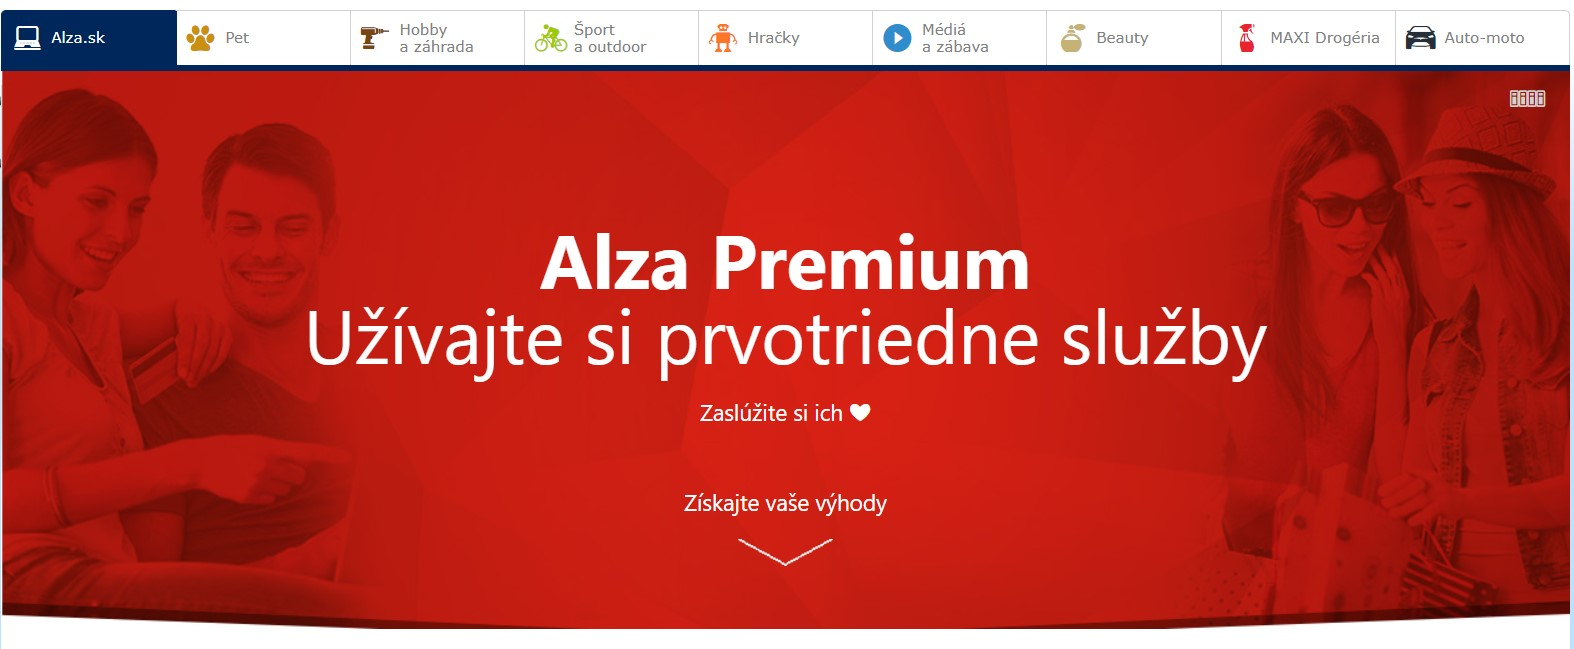 Alza premium Alza.sk